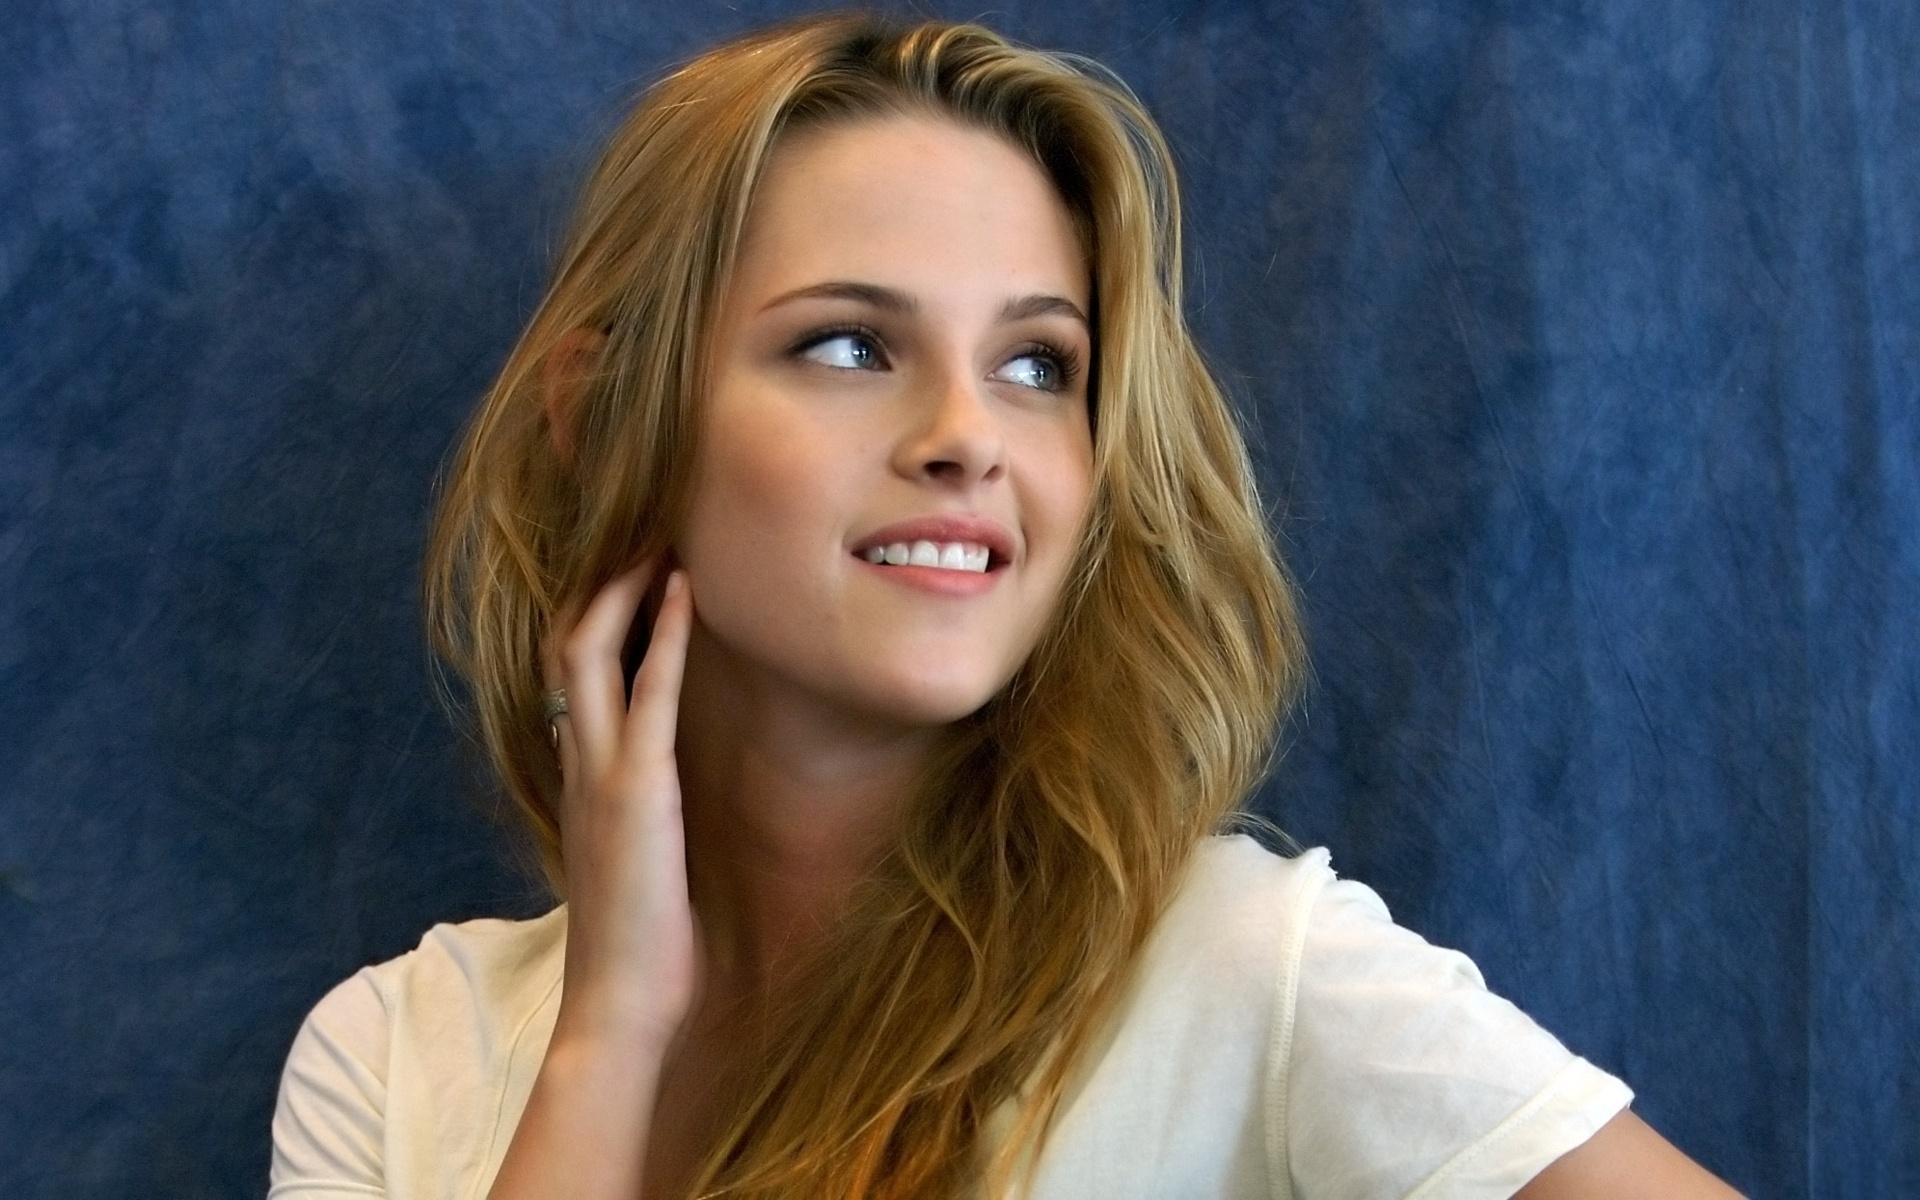 Beautiful Smile Wallpaper: Kristen Stewart Full HD Wallpaper And Background Image